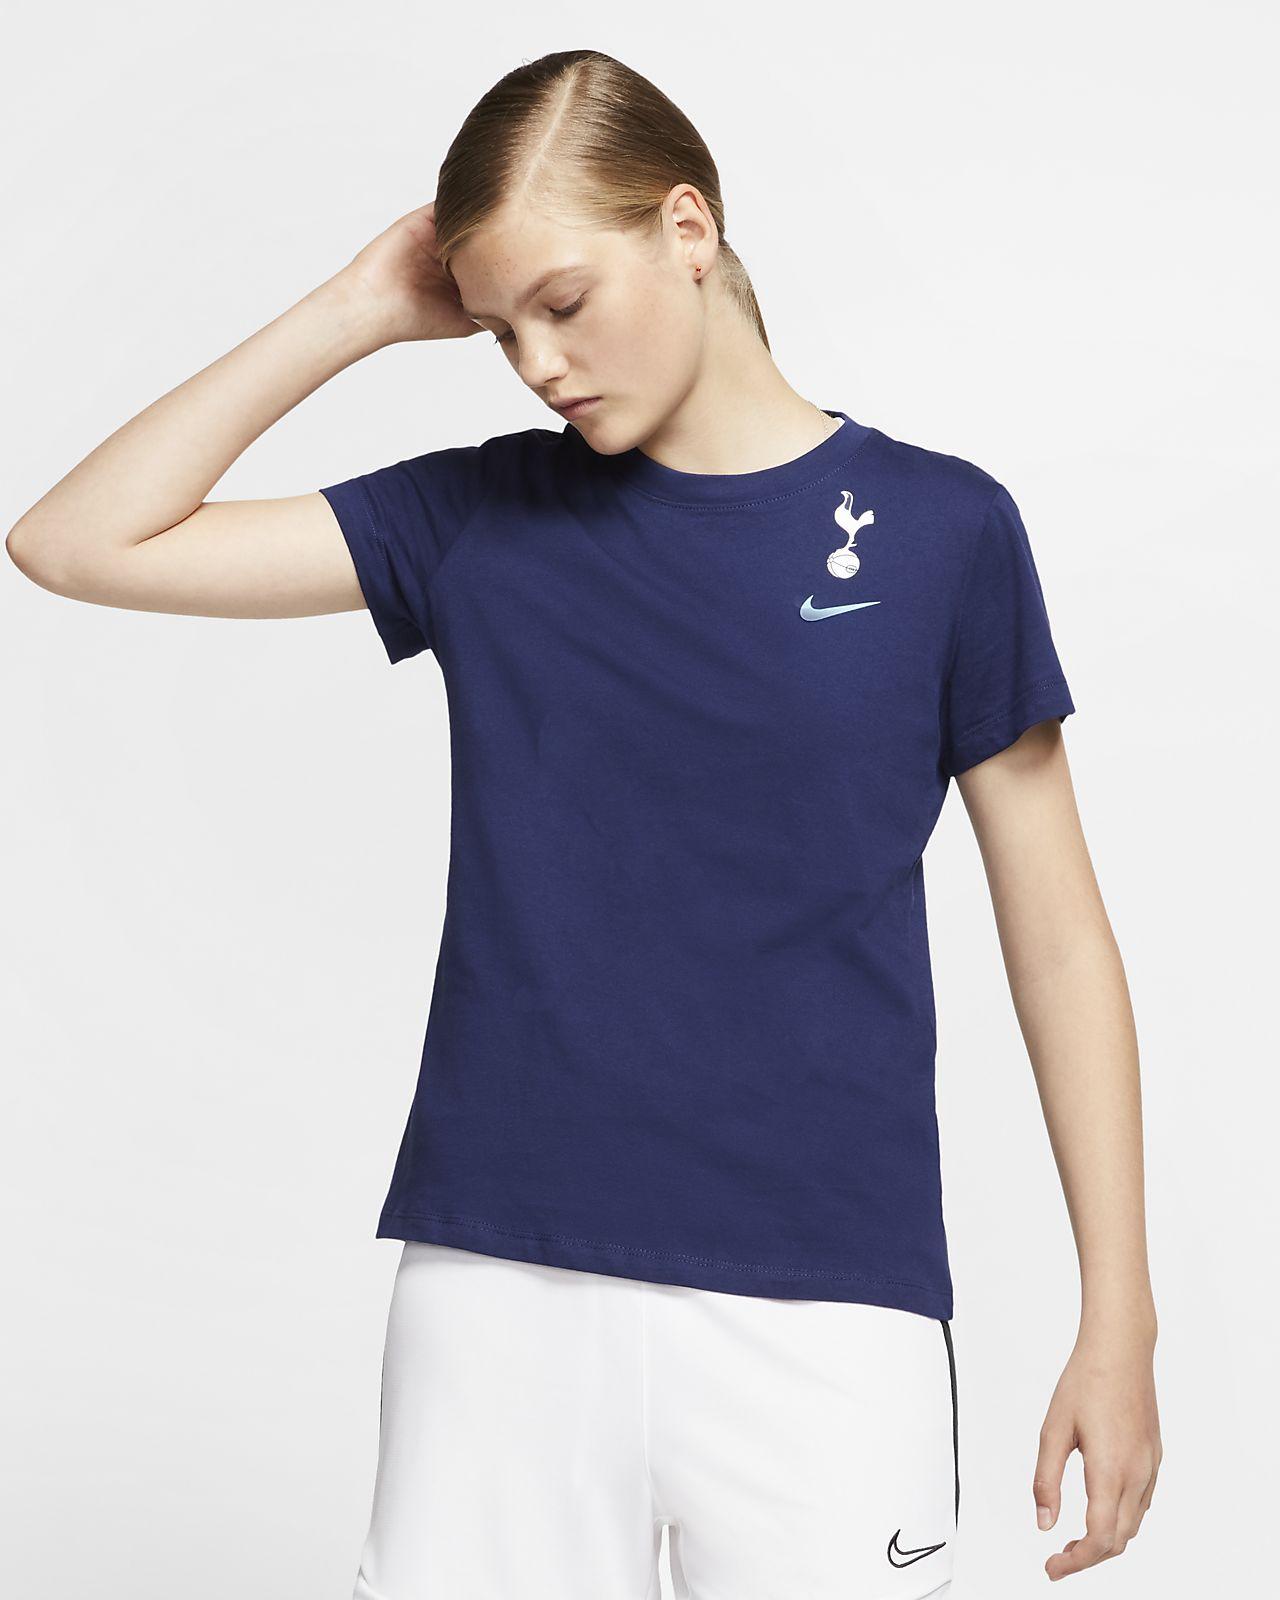 Tottenham Hotspur Damen-T-Shirt